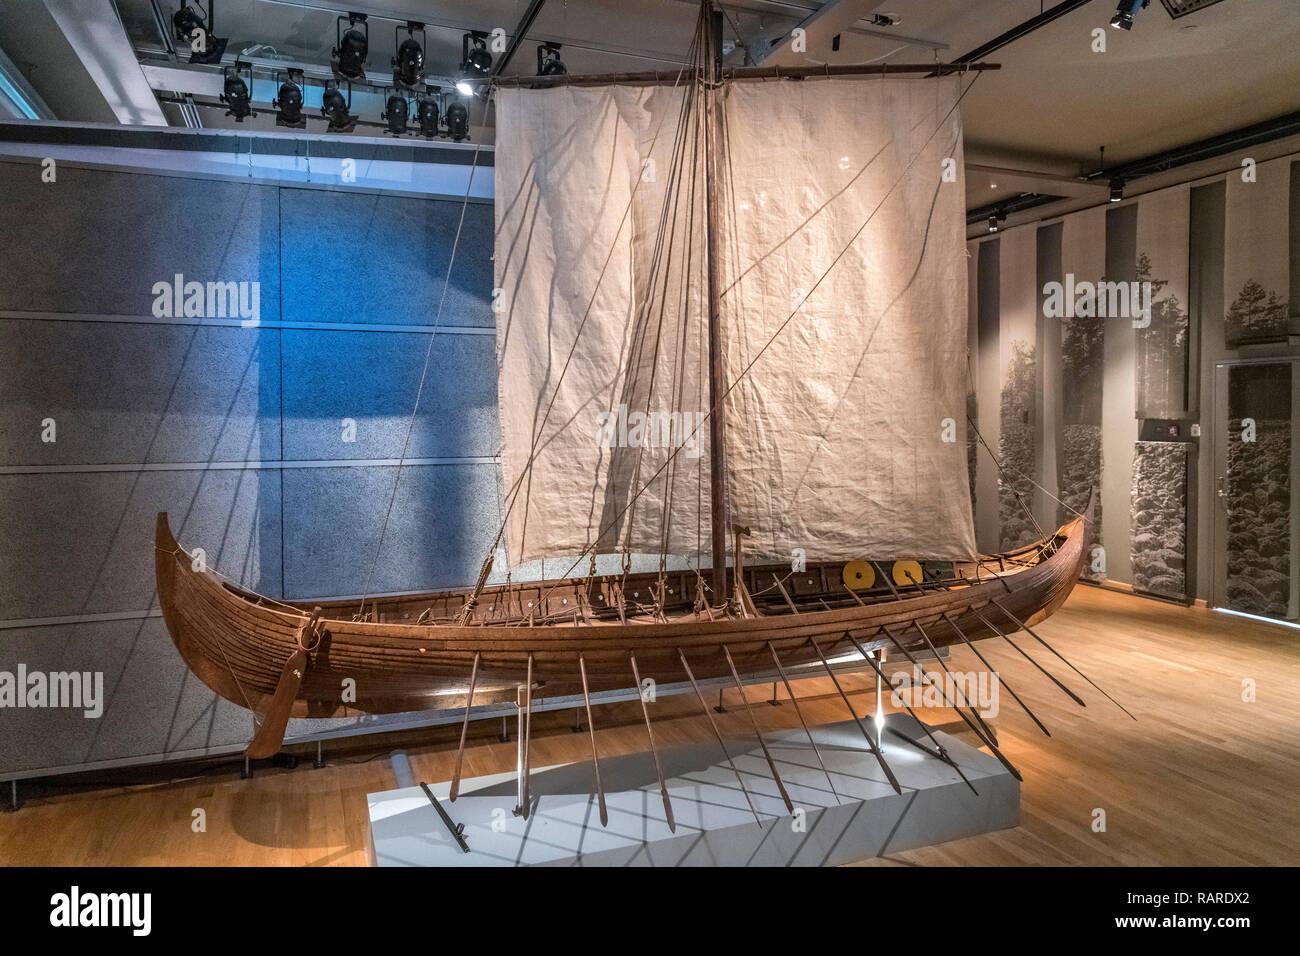 Viking ship. 1:6 scale model of the 9th-Century Gokstad Ship, Swedish History Museum (Historiska museet), Stockholm, Sweden - Stock Image